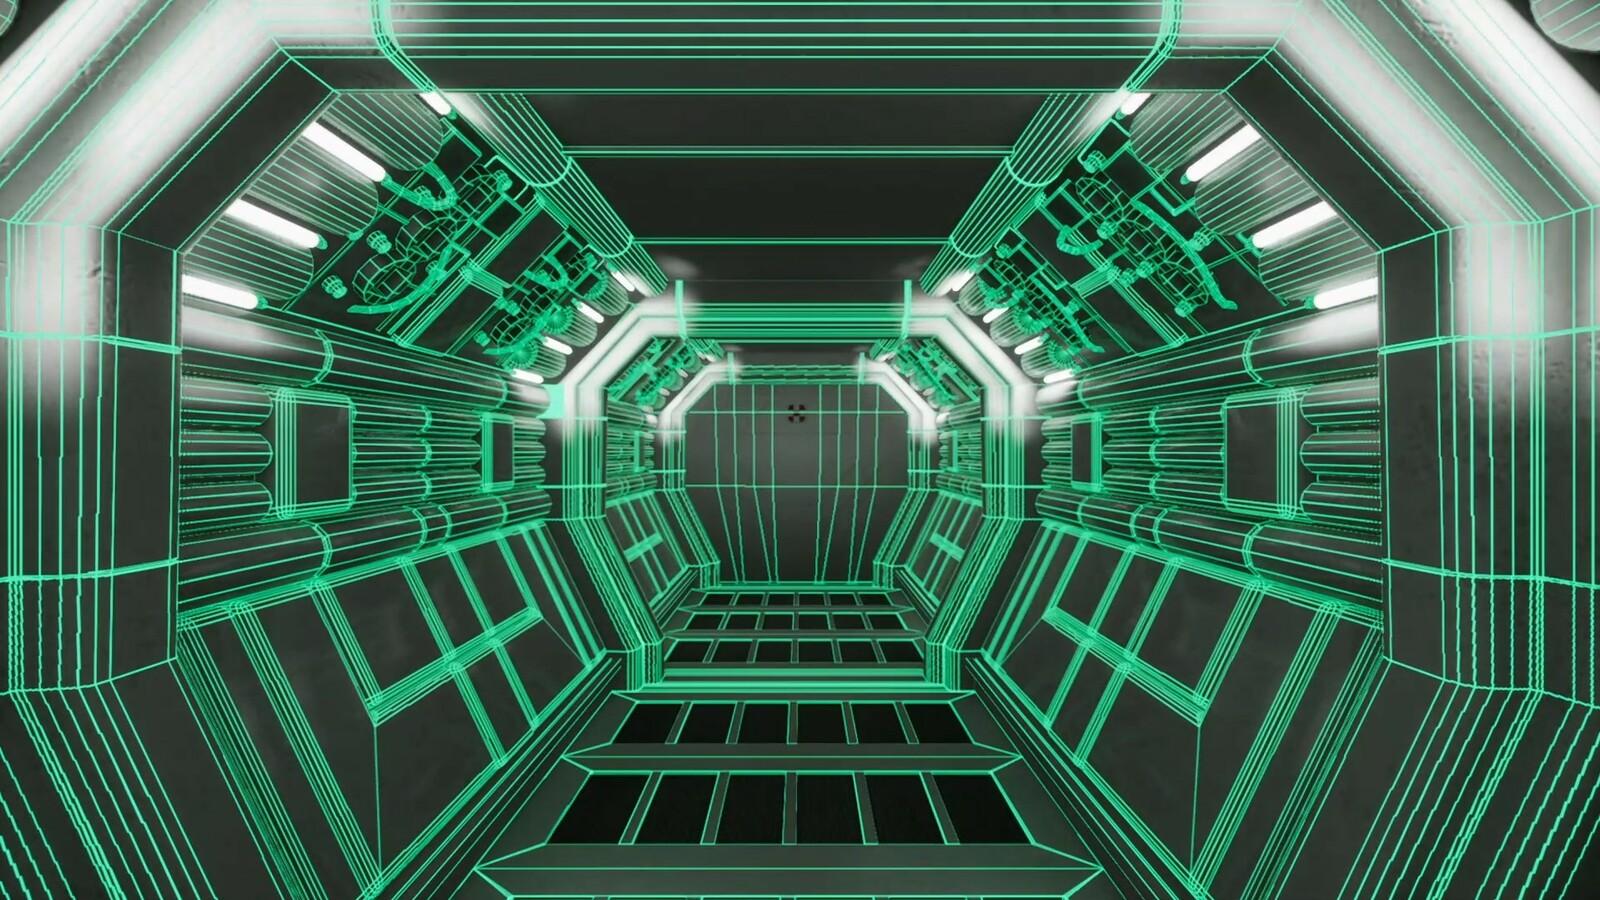 Modular Corridor - wireframe